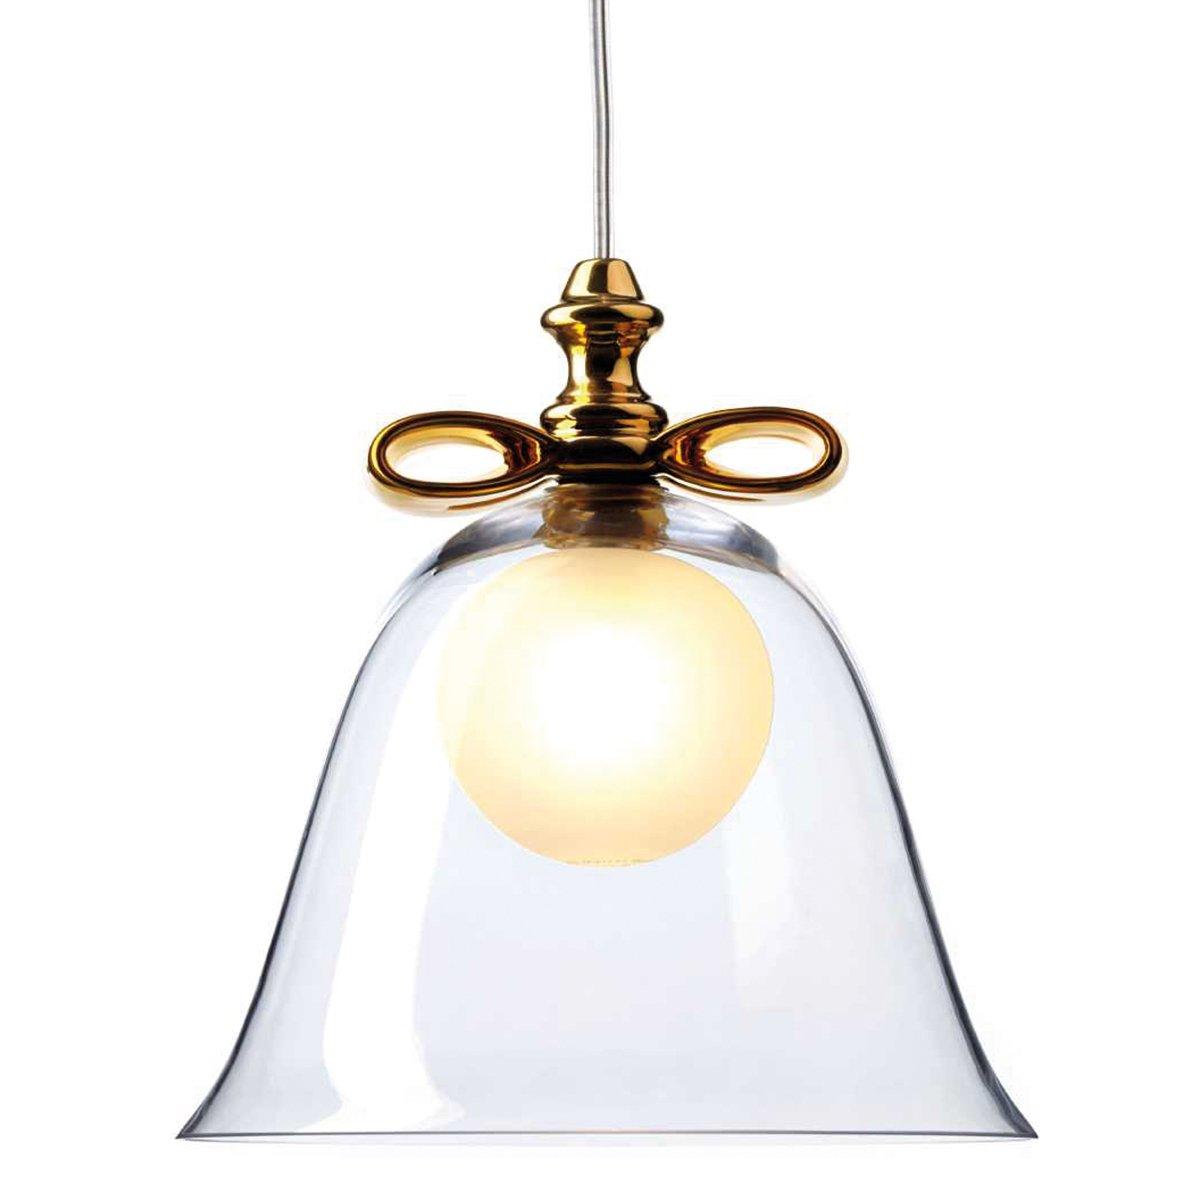 Moooi Bell Hanglamp S Transparant - Goud